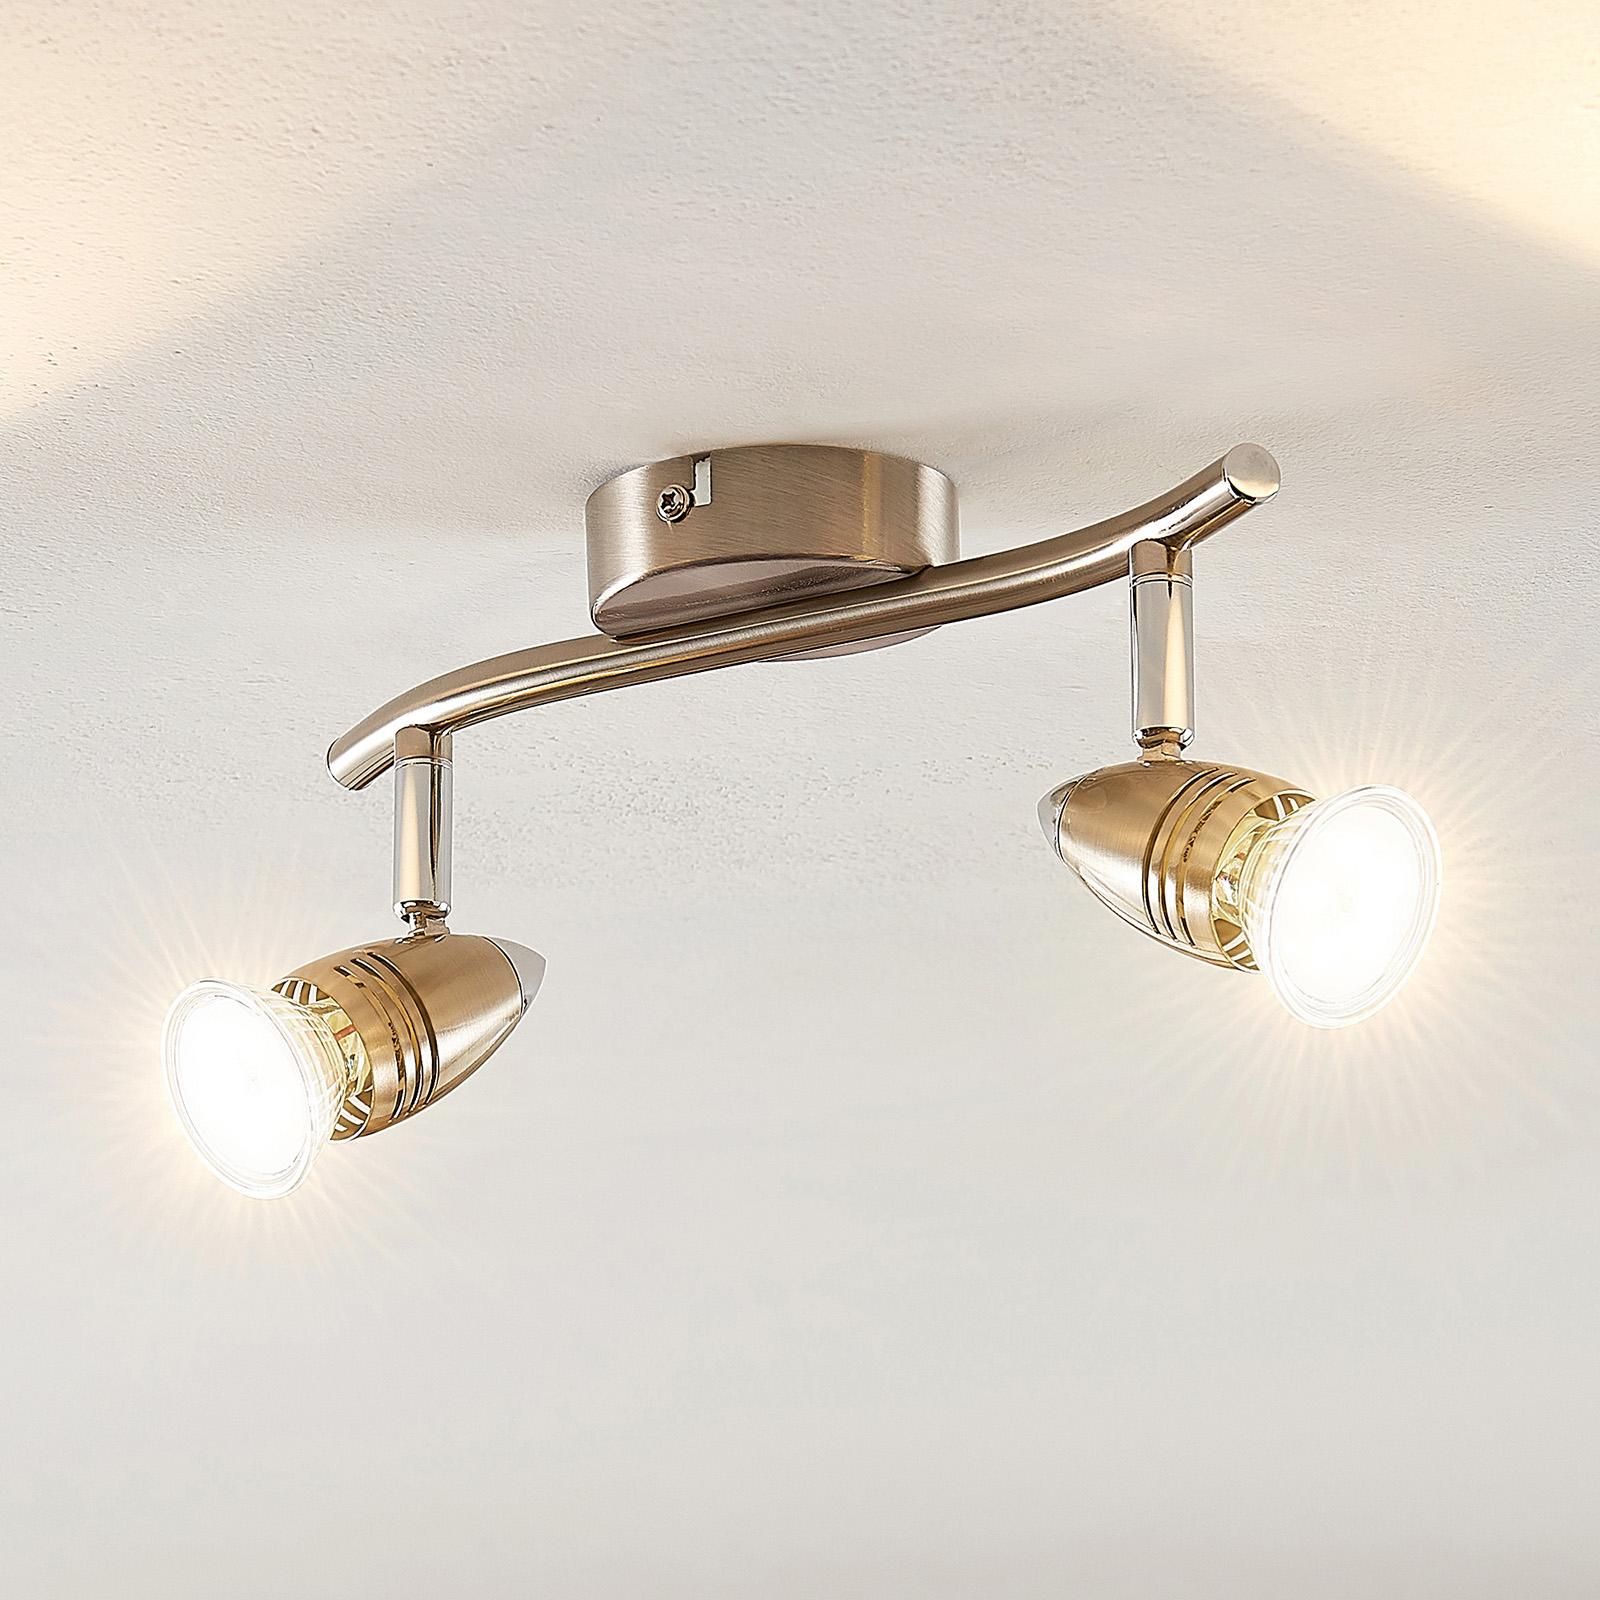 ELC Kalean LED ceiling spotlight, nickel, 2-bulb_9950857_1